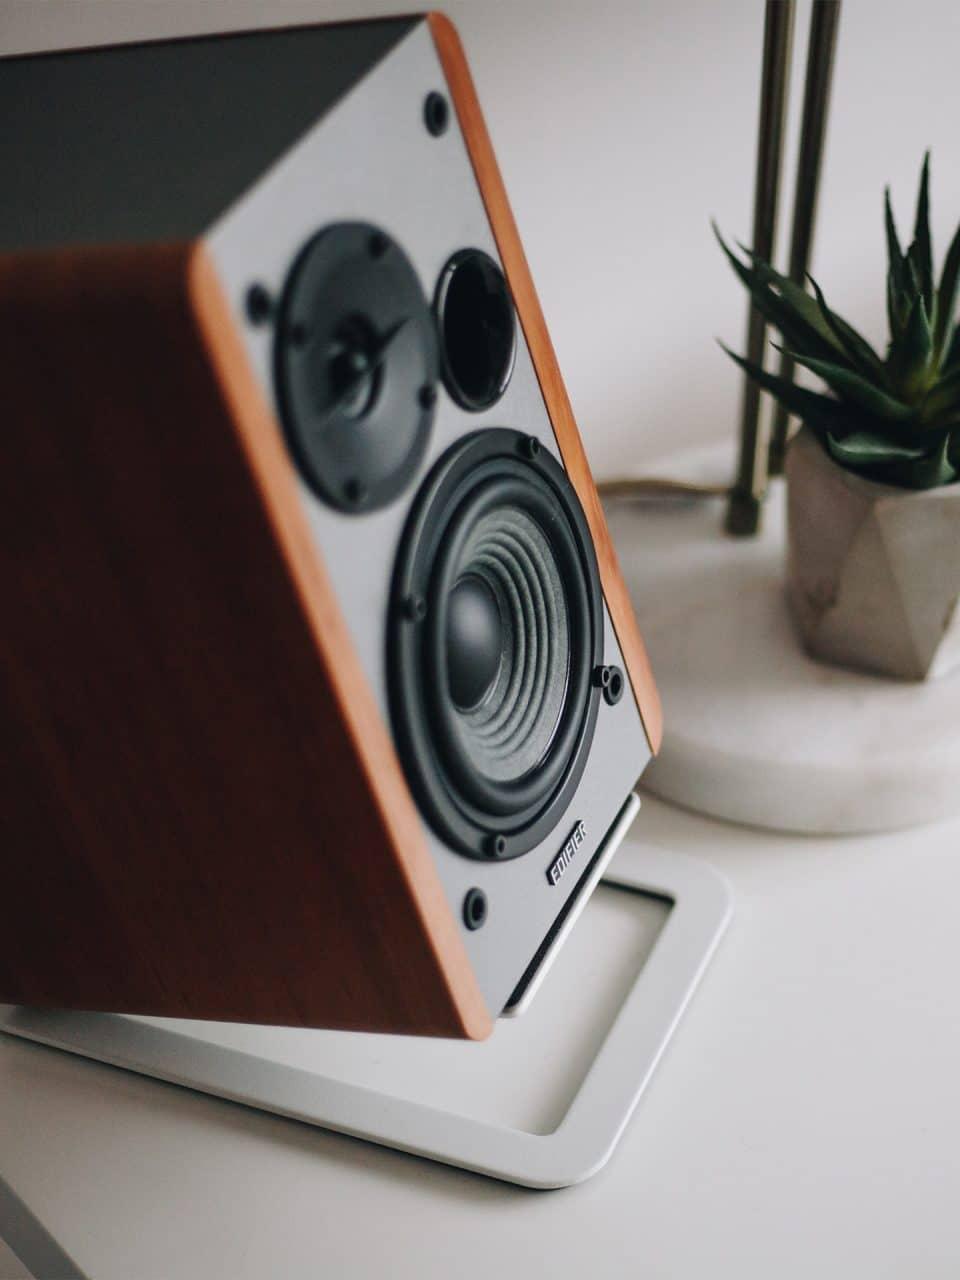 Image of speakers